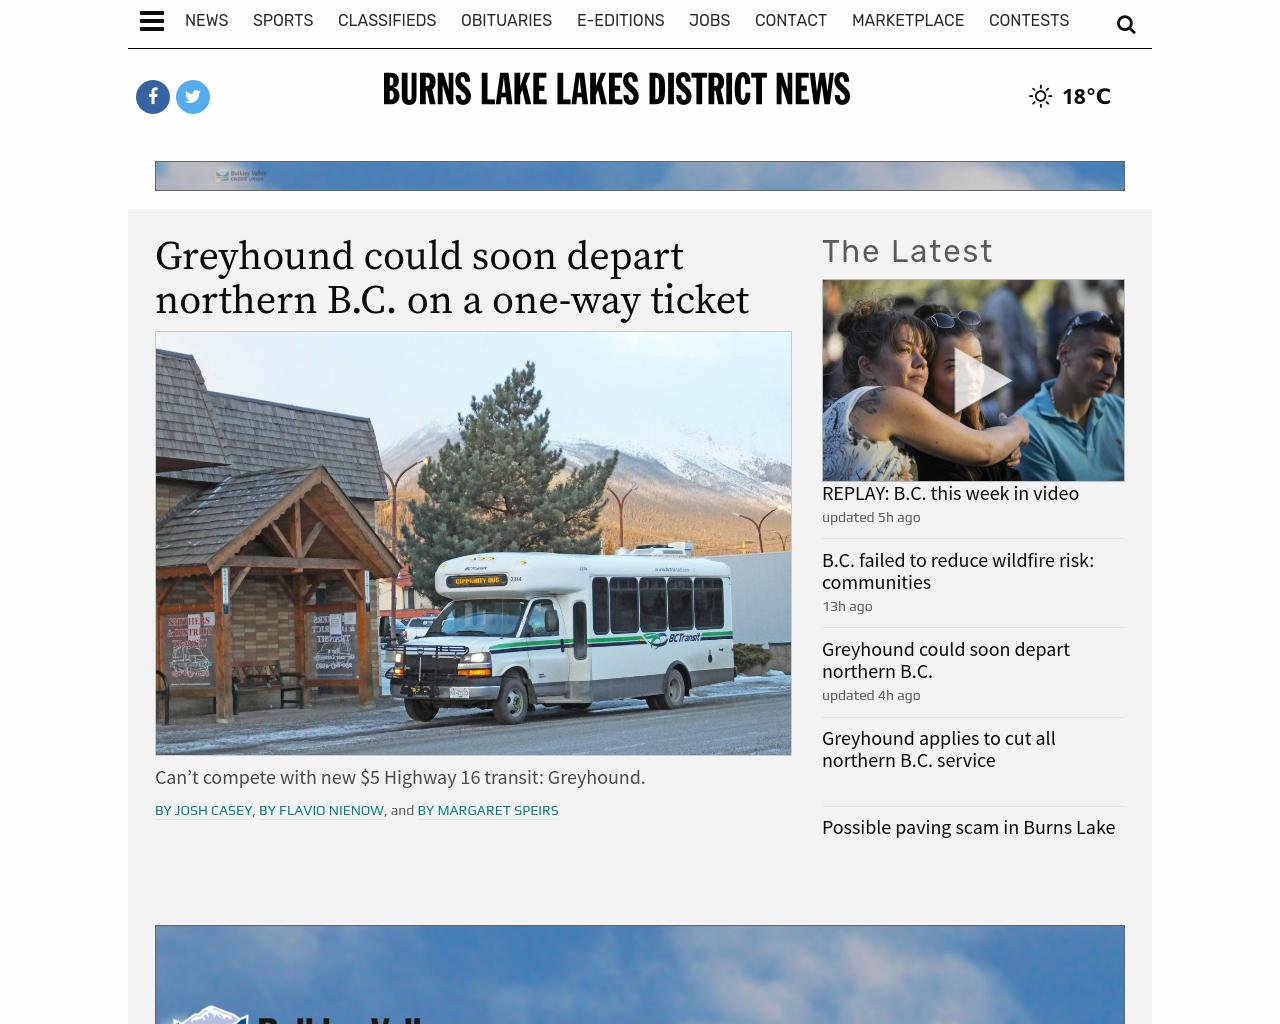 Burns-Lake-Lakes-District-News-Advertising-Reviews-Pricing